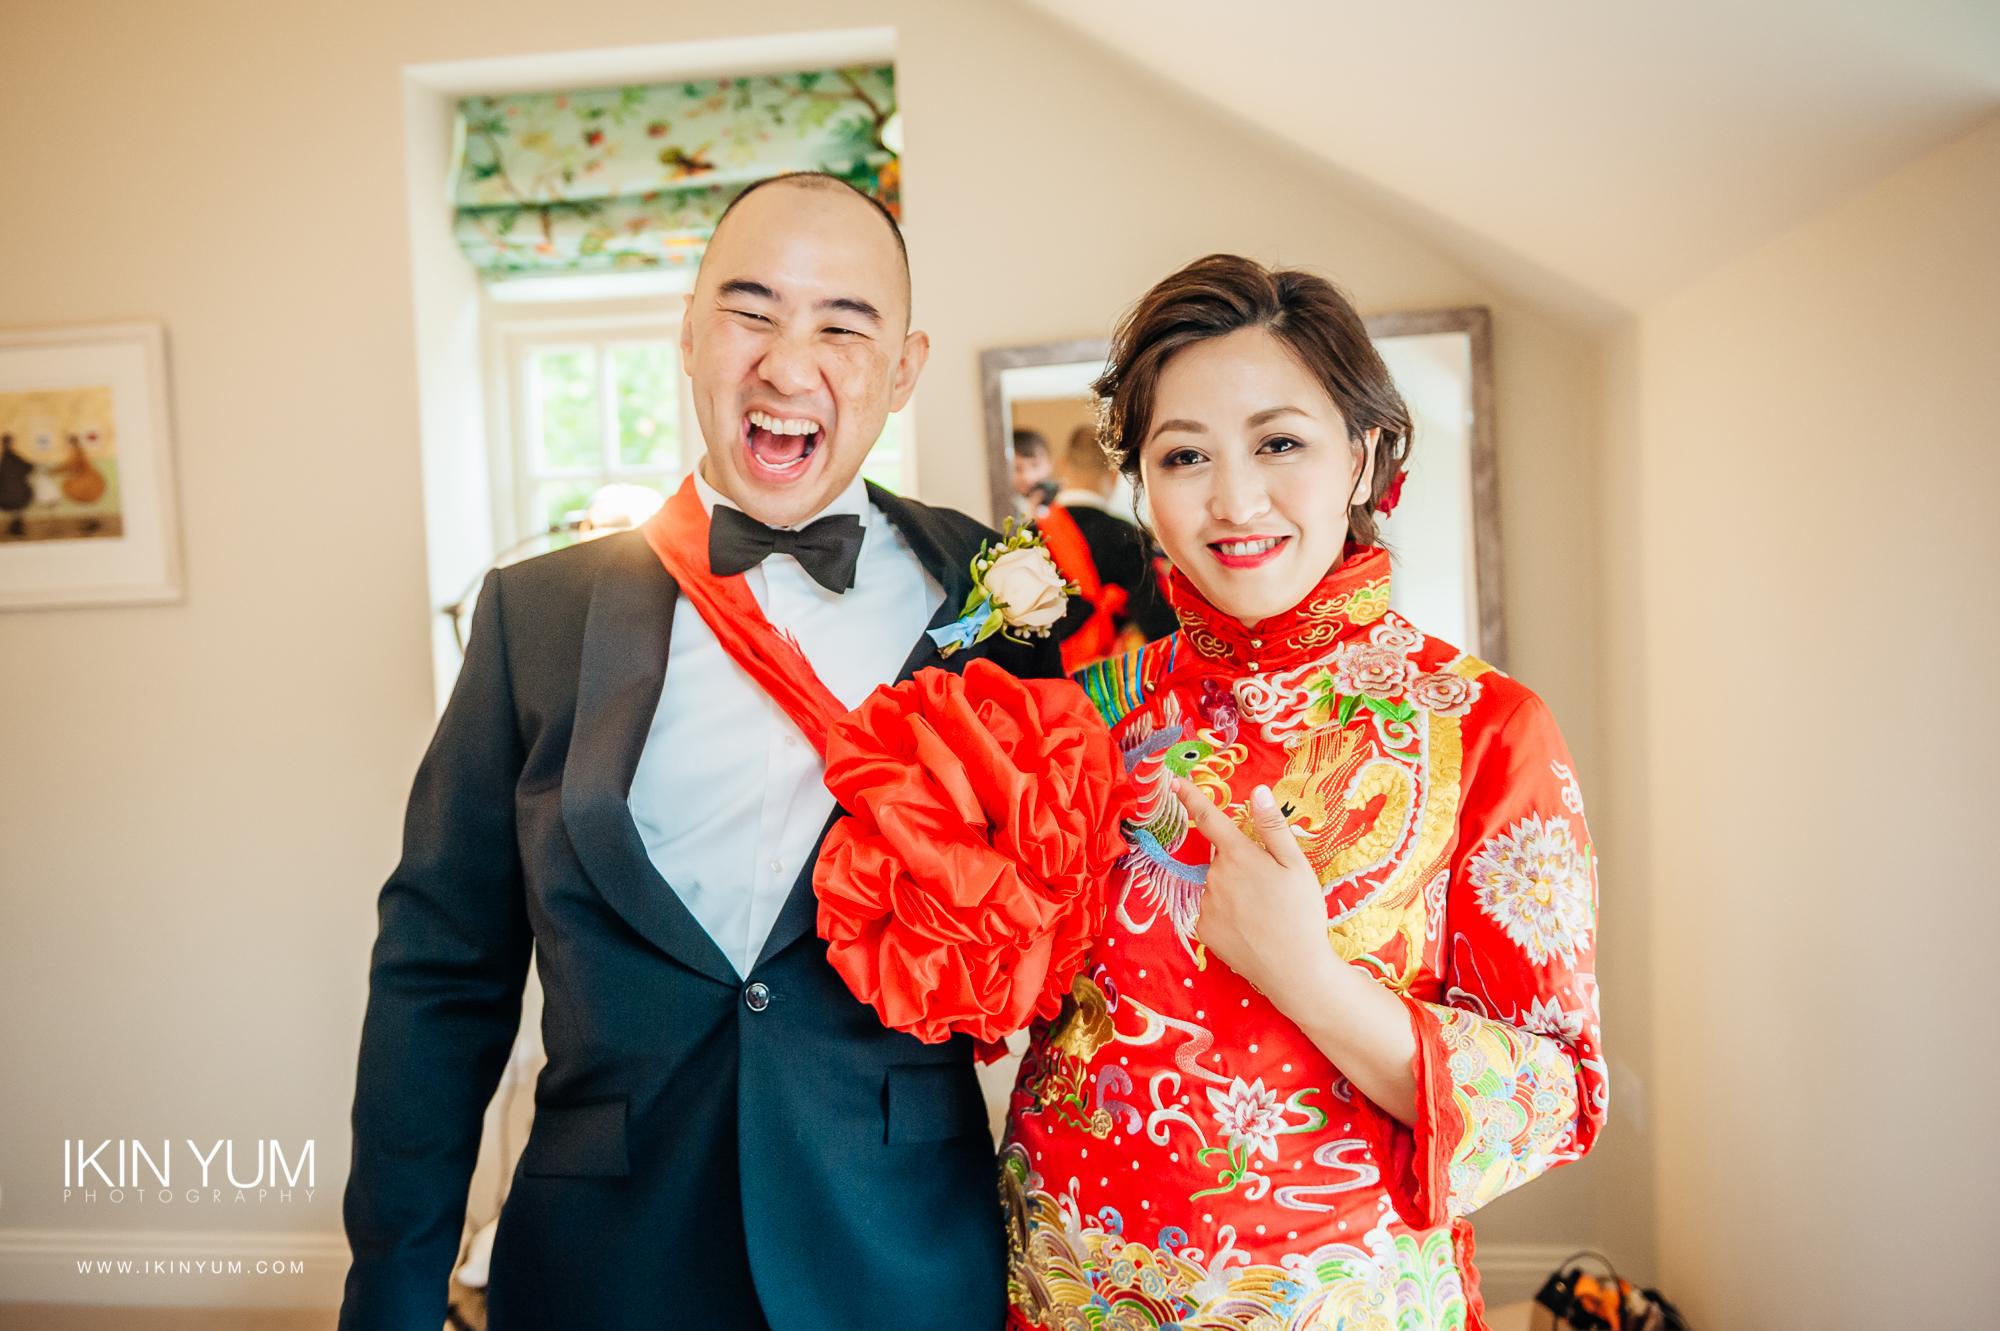 Elmore Court Wedding- Ikin Yum Photography-0027.jpg